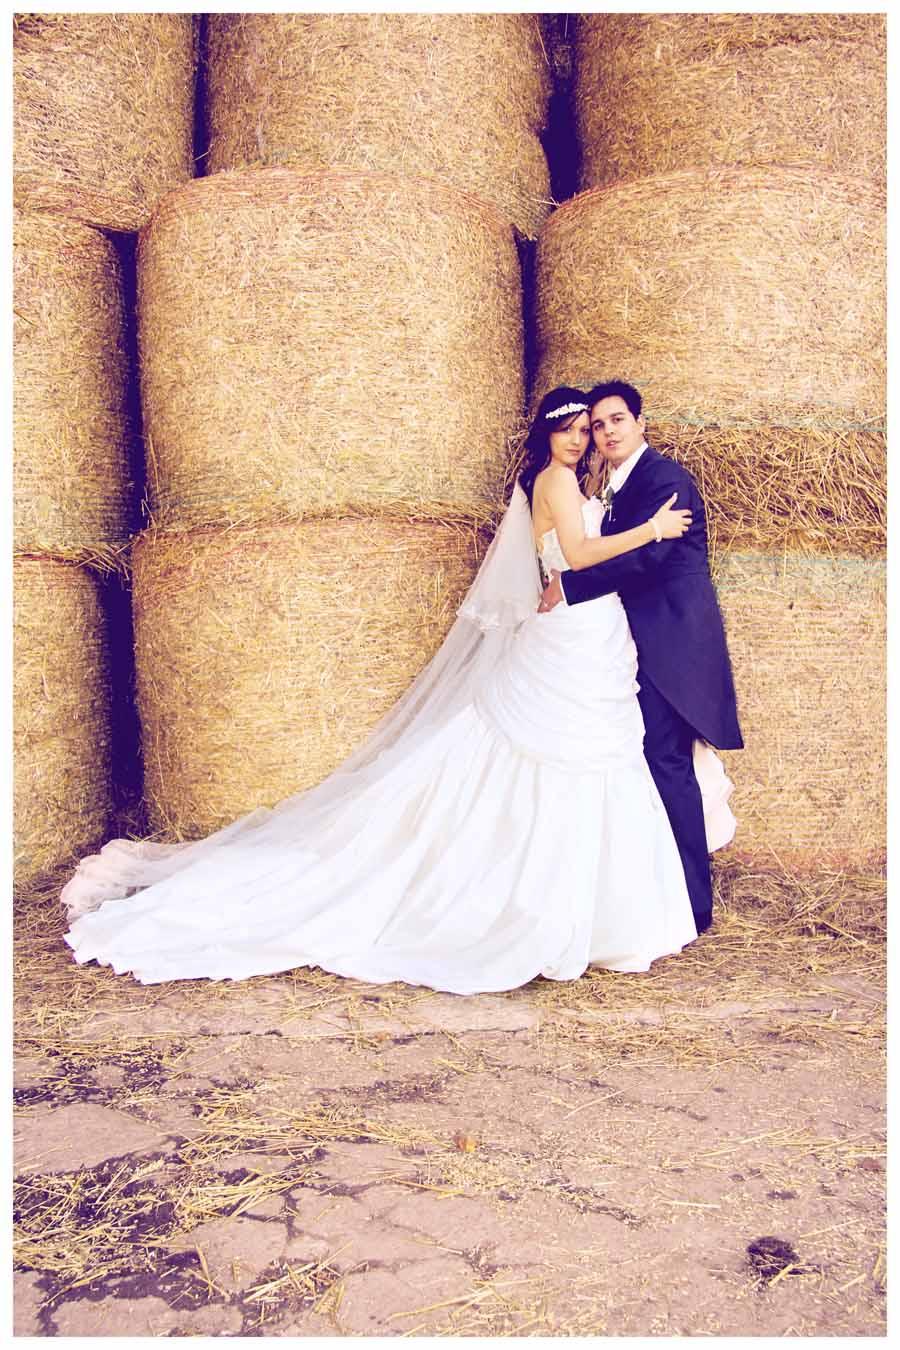 BRIDE & GROOM Photos by  Simeon Thaw copyright 2014 (90).JPG